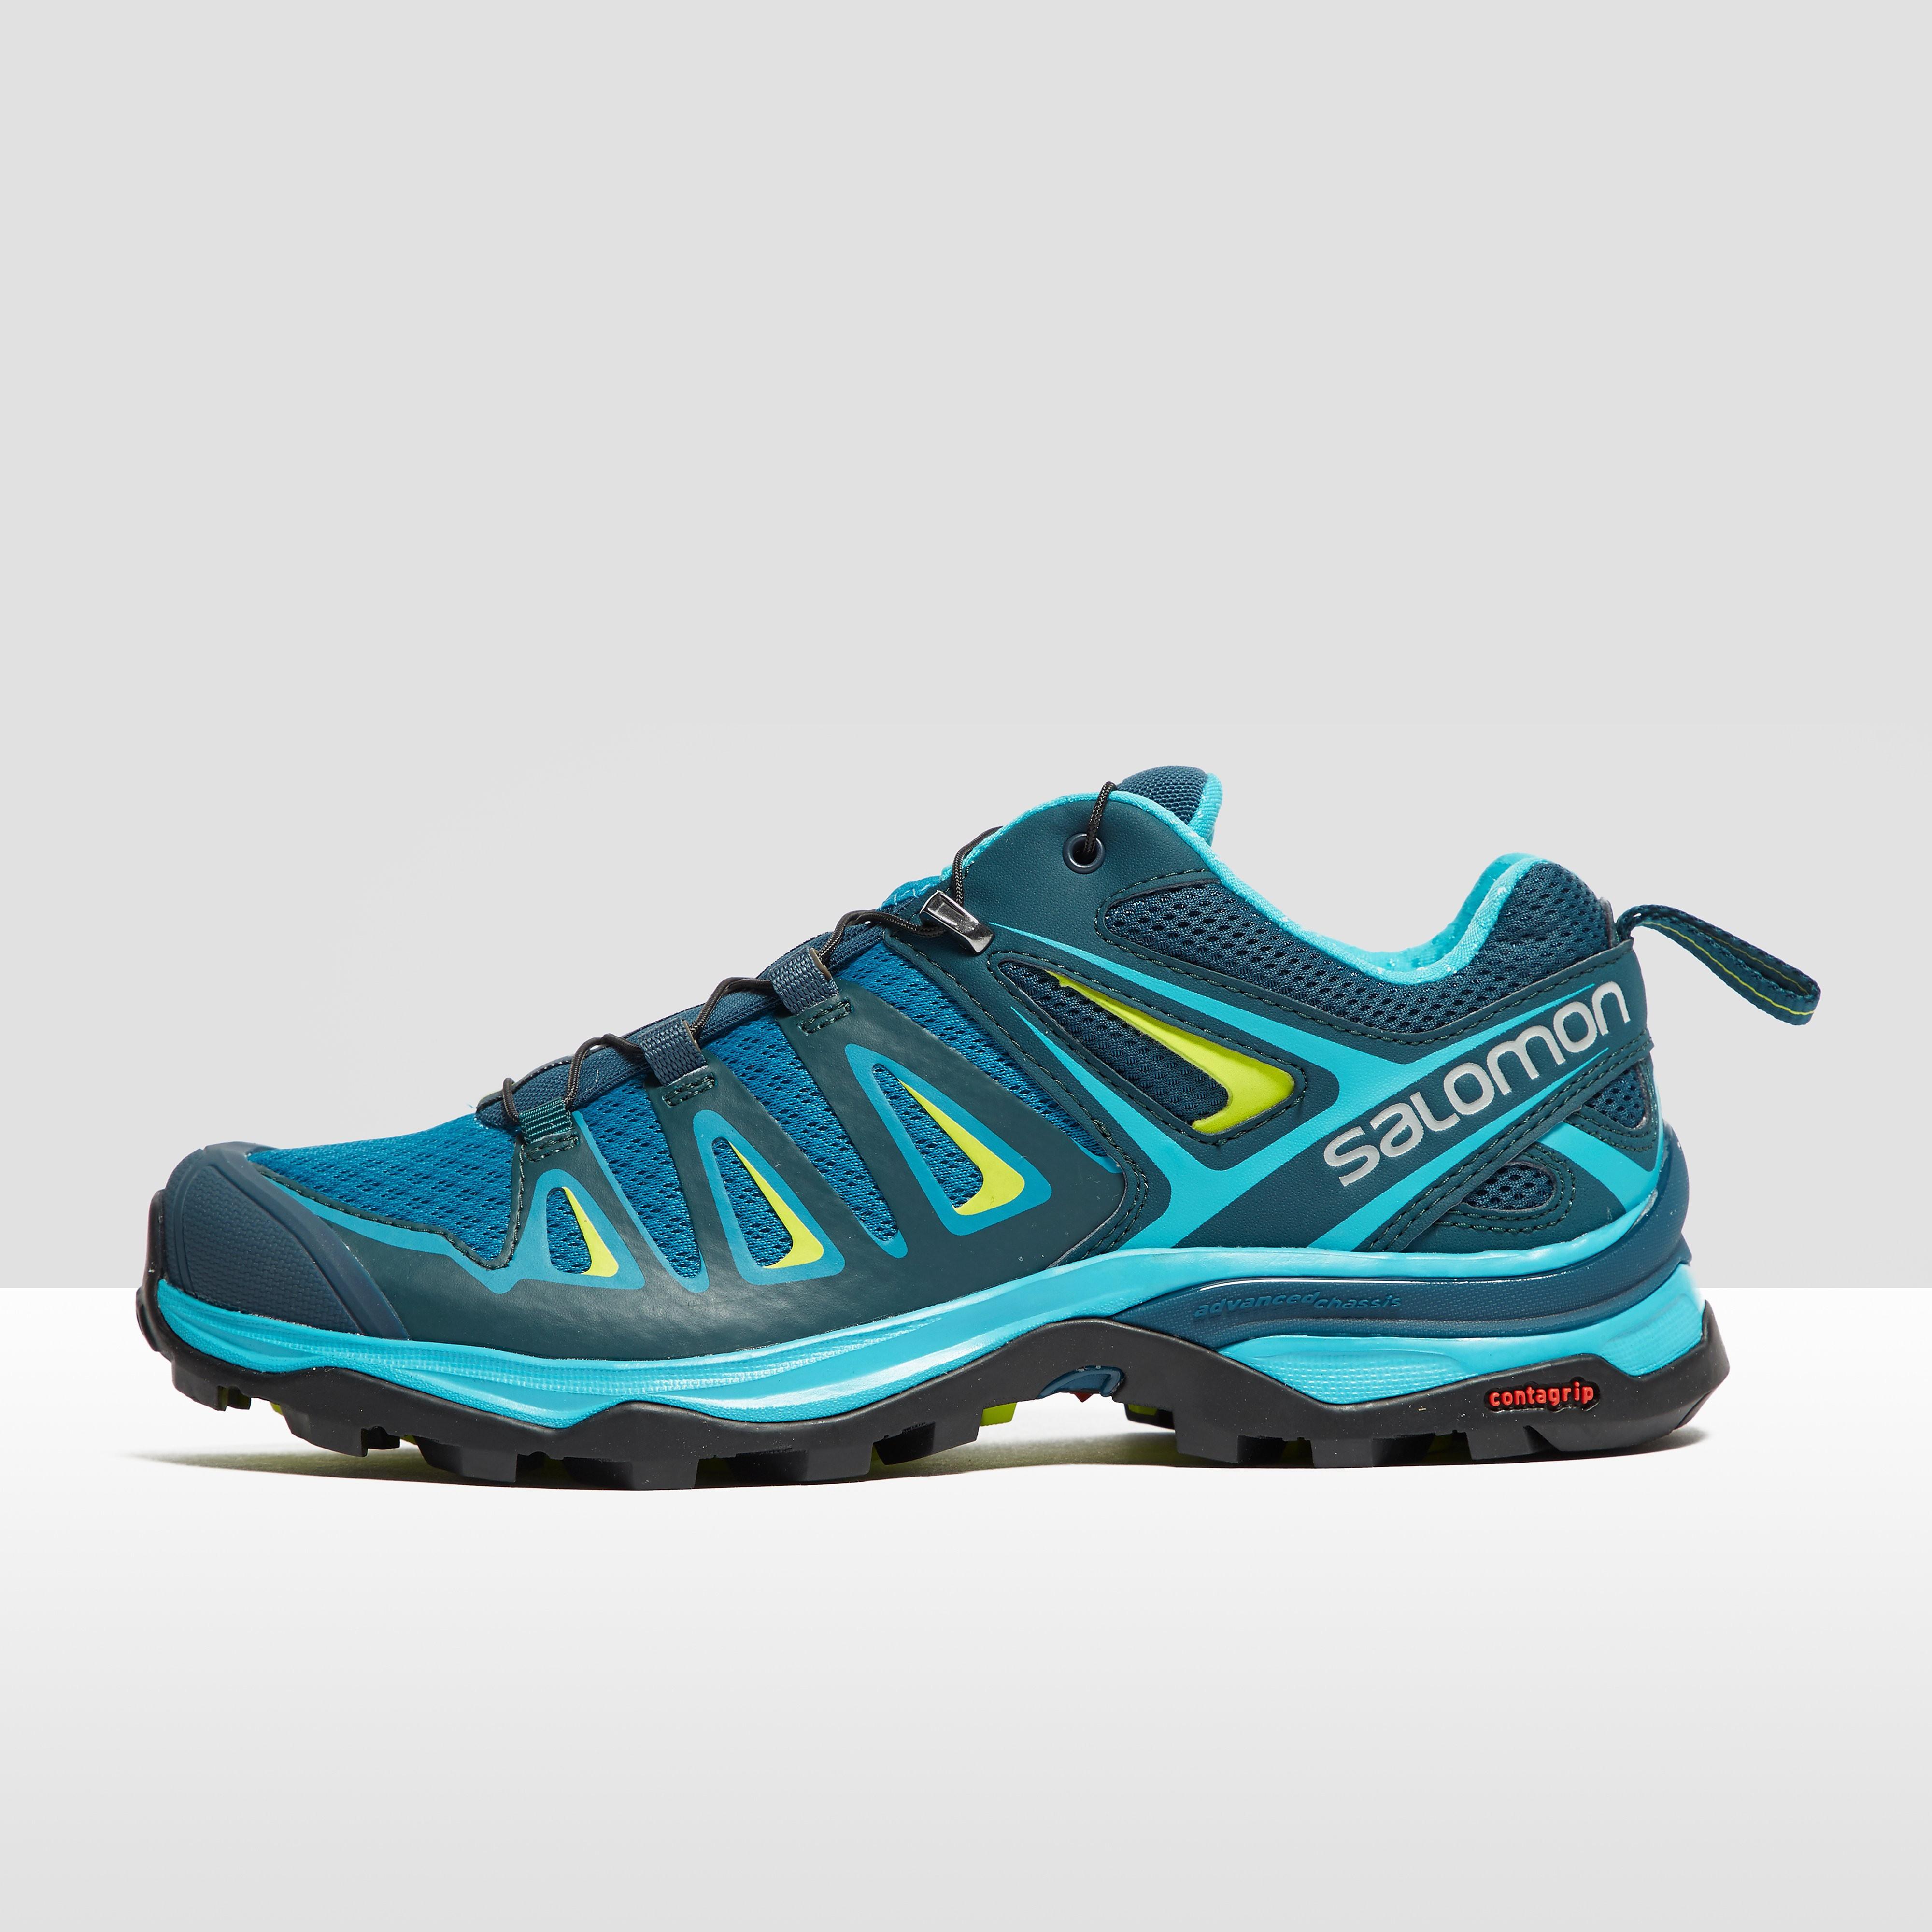 Salomon X ULTRA 3 Women's Outdoor Shoes